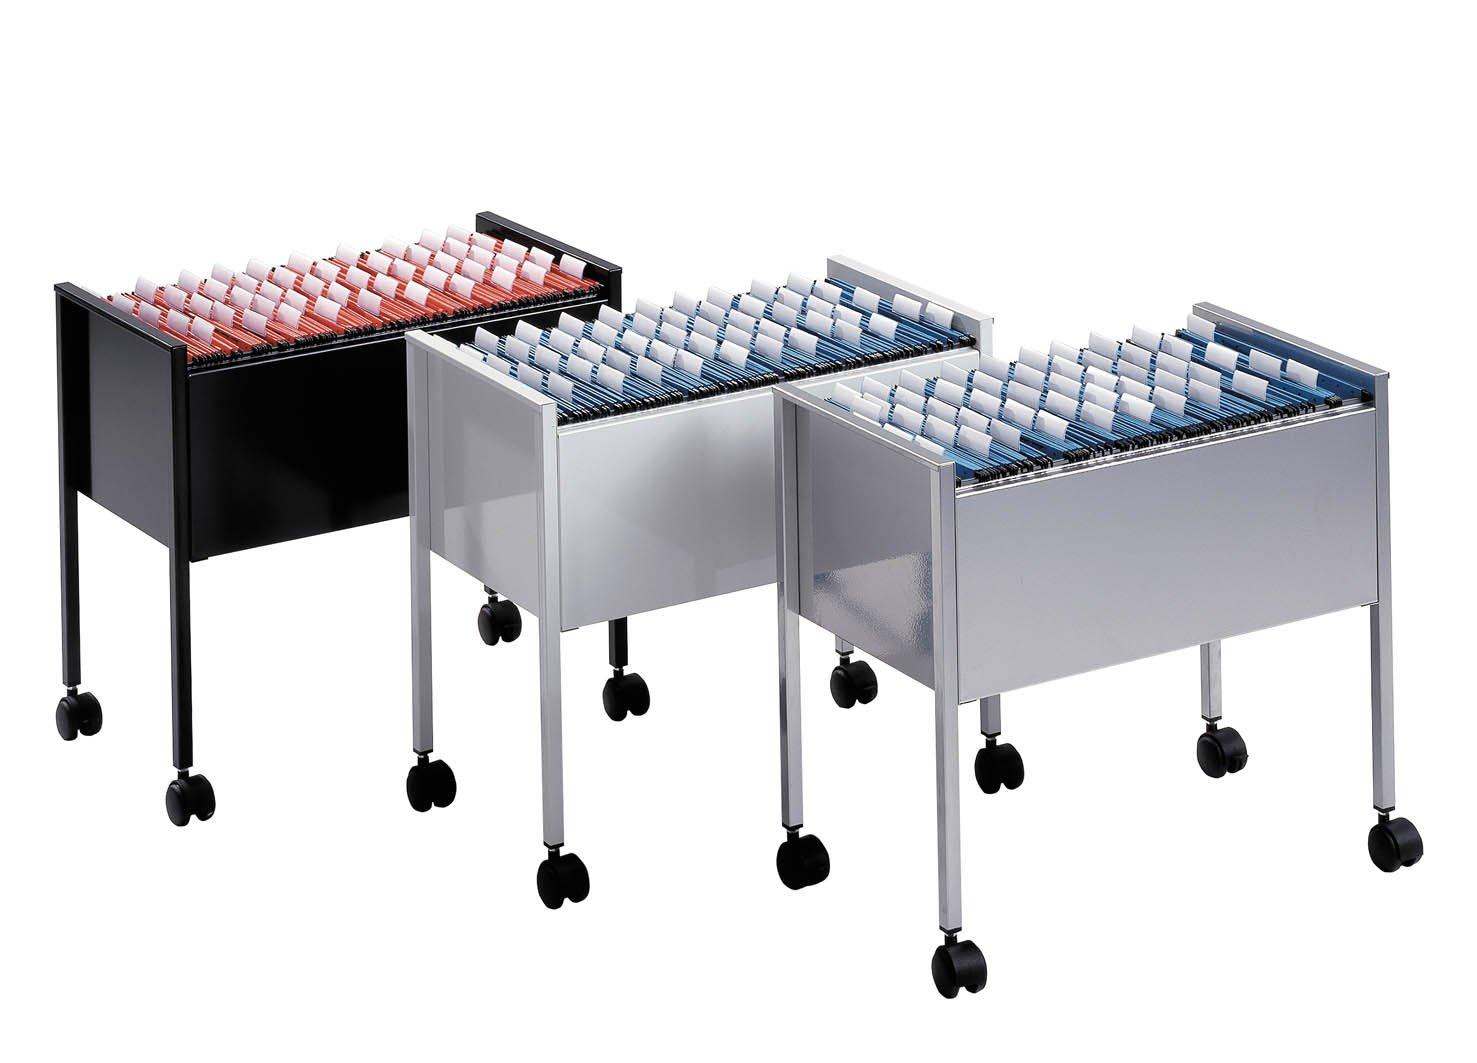 capacit/à 80 cartelle f.to A4 carrello per cartelle sospese 80 A4 655x592x368 mm DURABLE 309510 grigio Economy